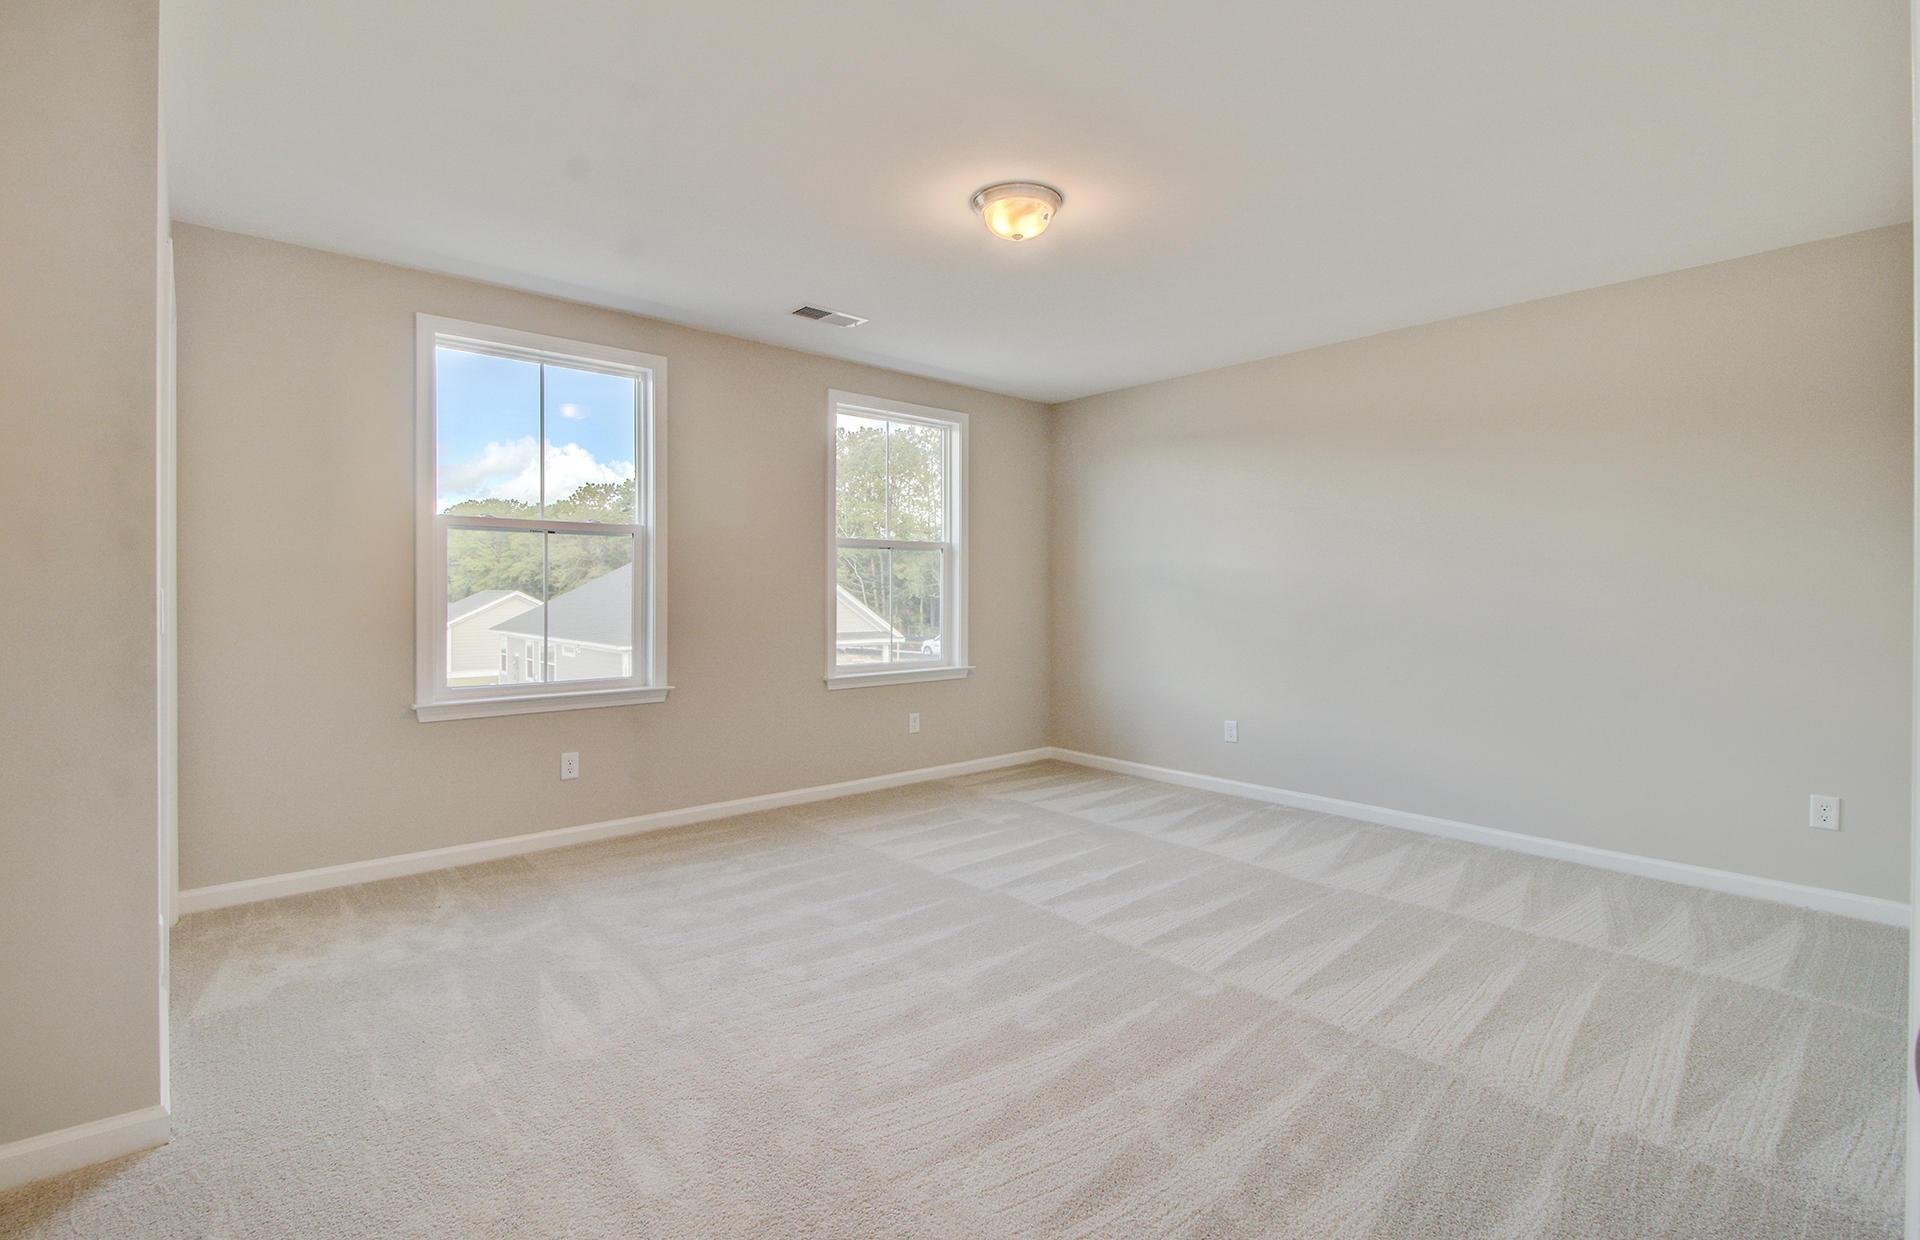 White Gables Homes For Sale - 207 Angelica, Summerville, SC - 26